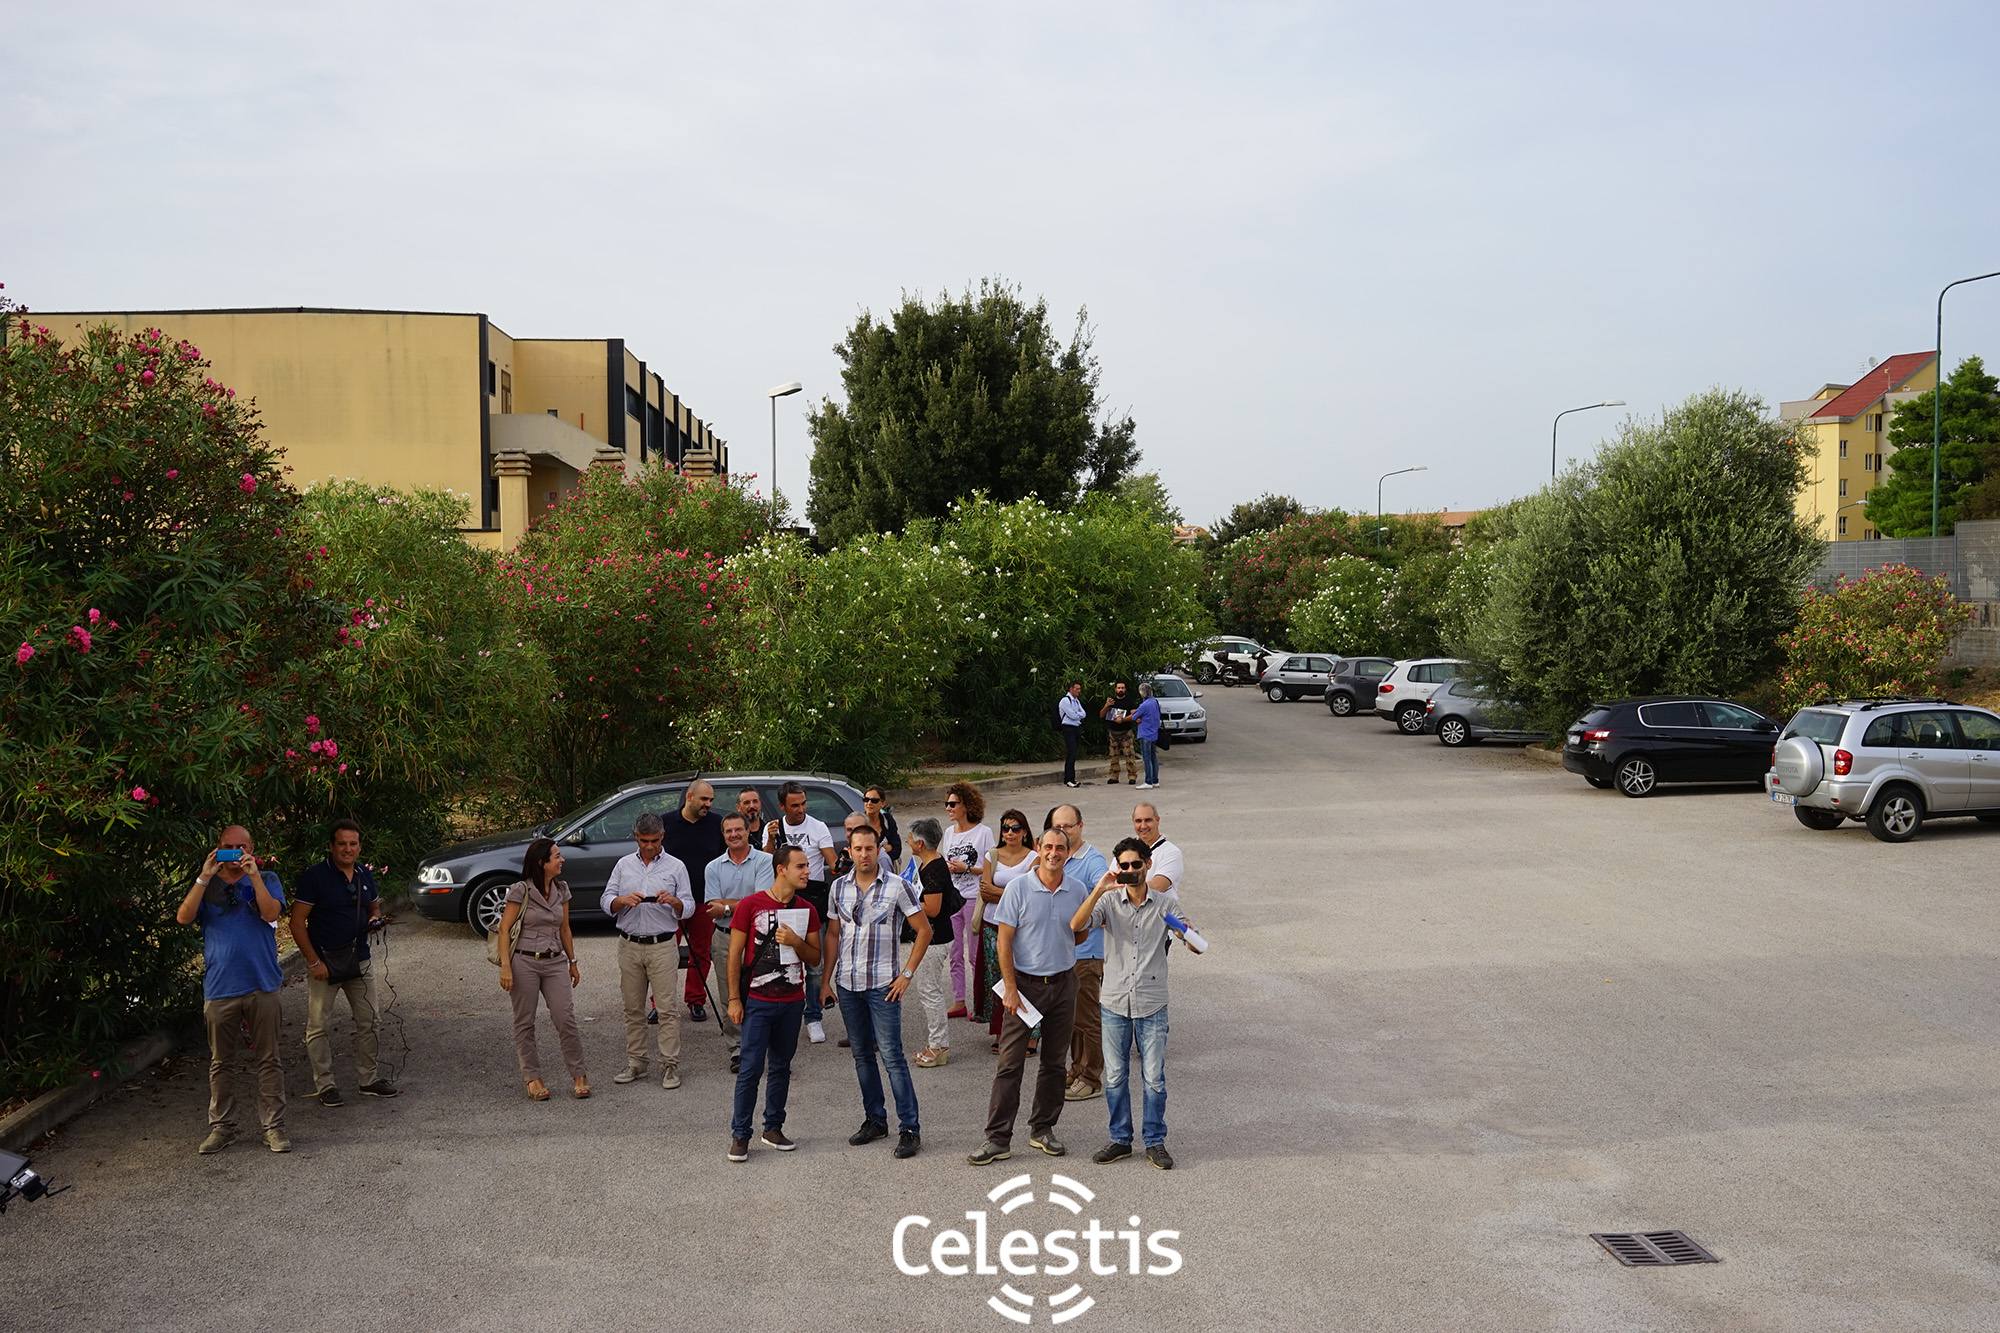 Copyright Celestis